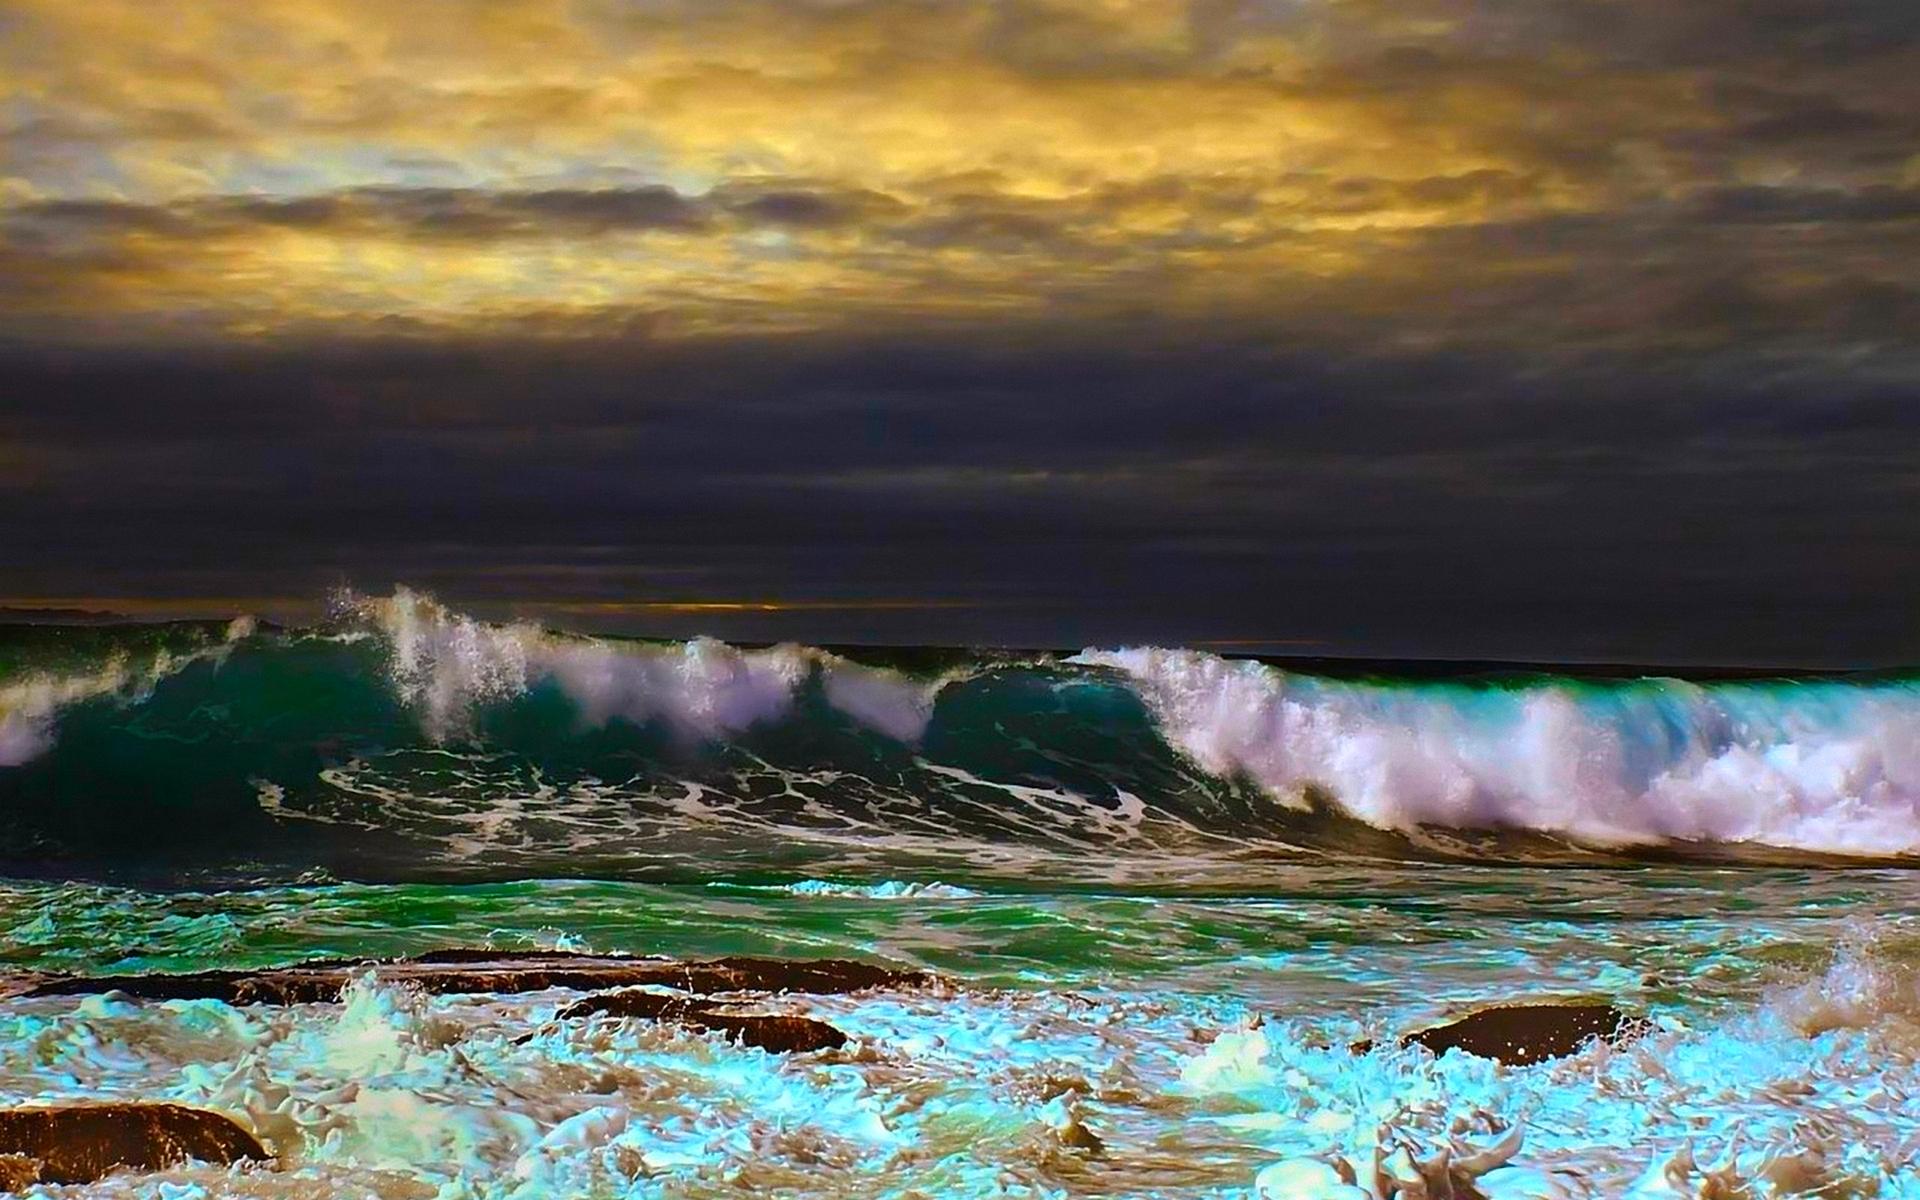 Ocean Storm Waves Wallpaper Dark Ocean Storm Waves hd 1920x1200